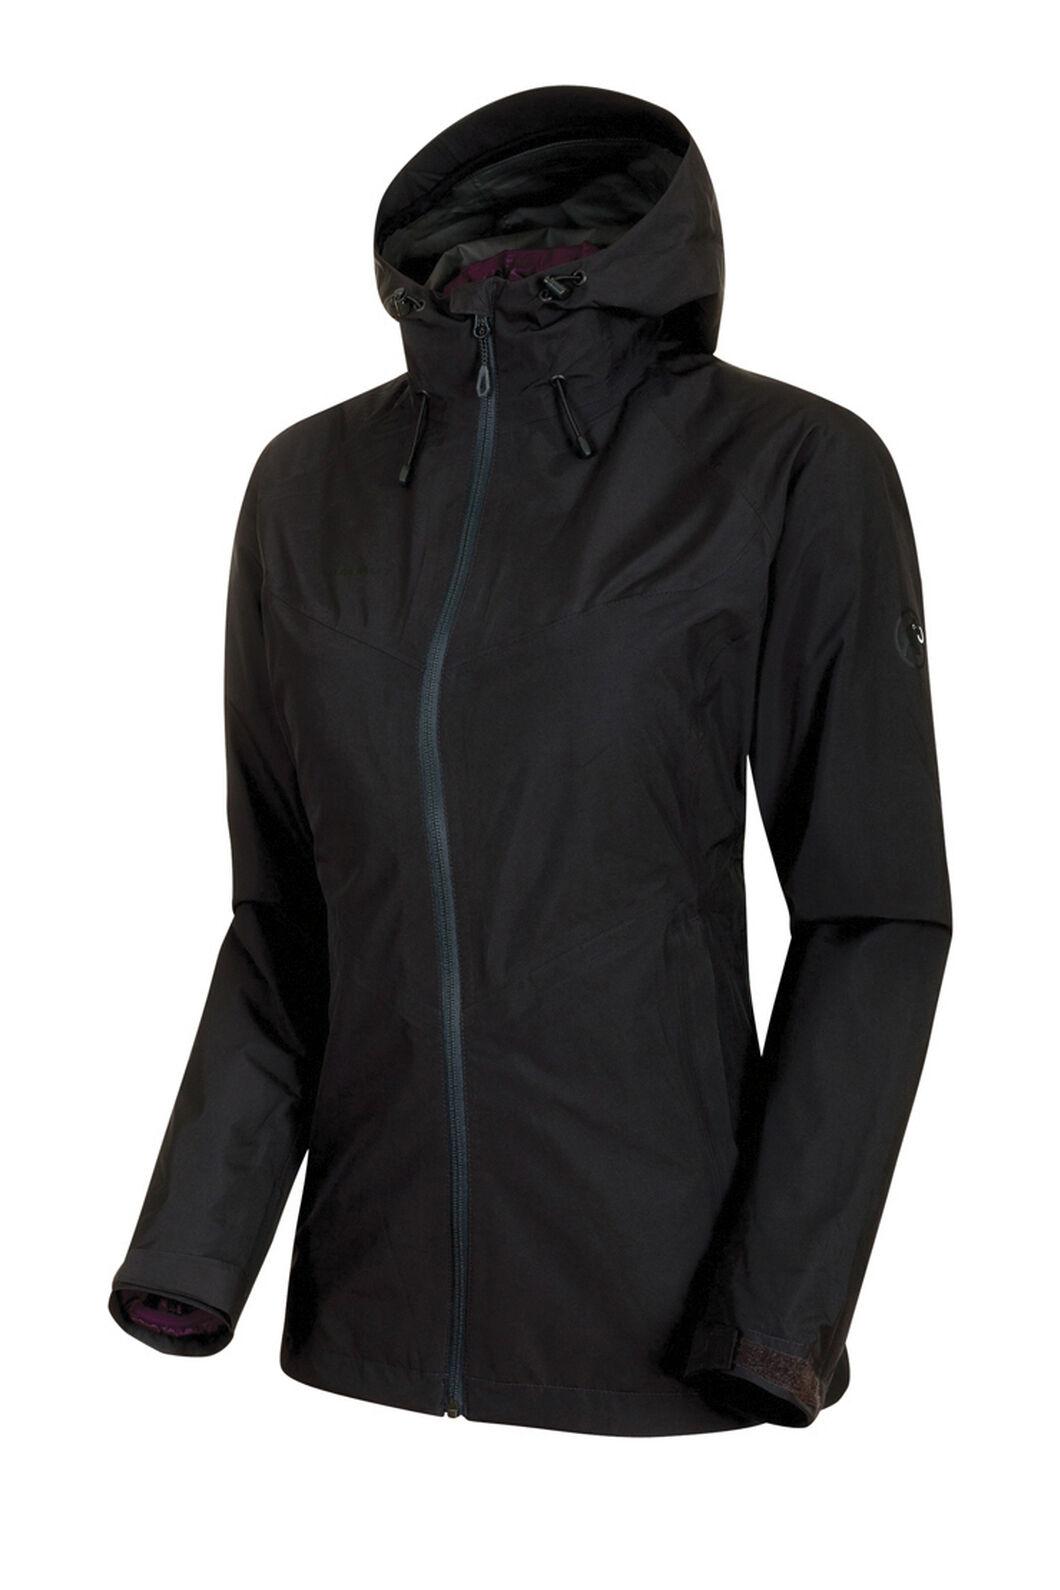 Mammut Convey 3 in 1 Hooded Hardshell Jacket - Women's, Black, hi-res